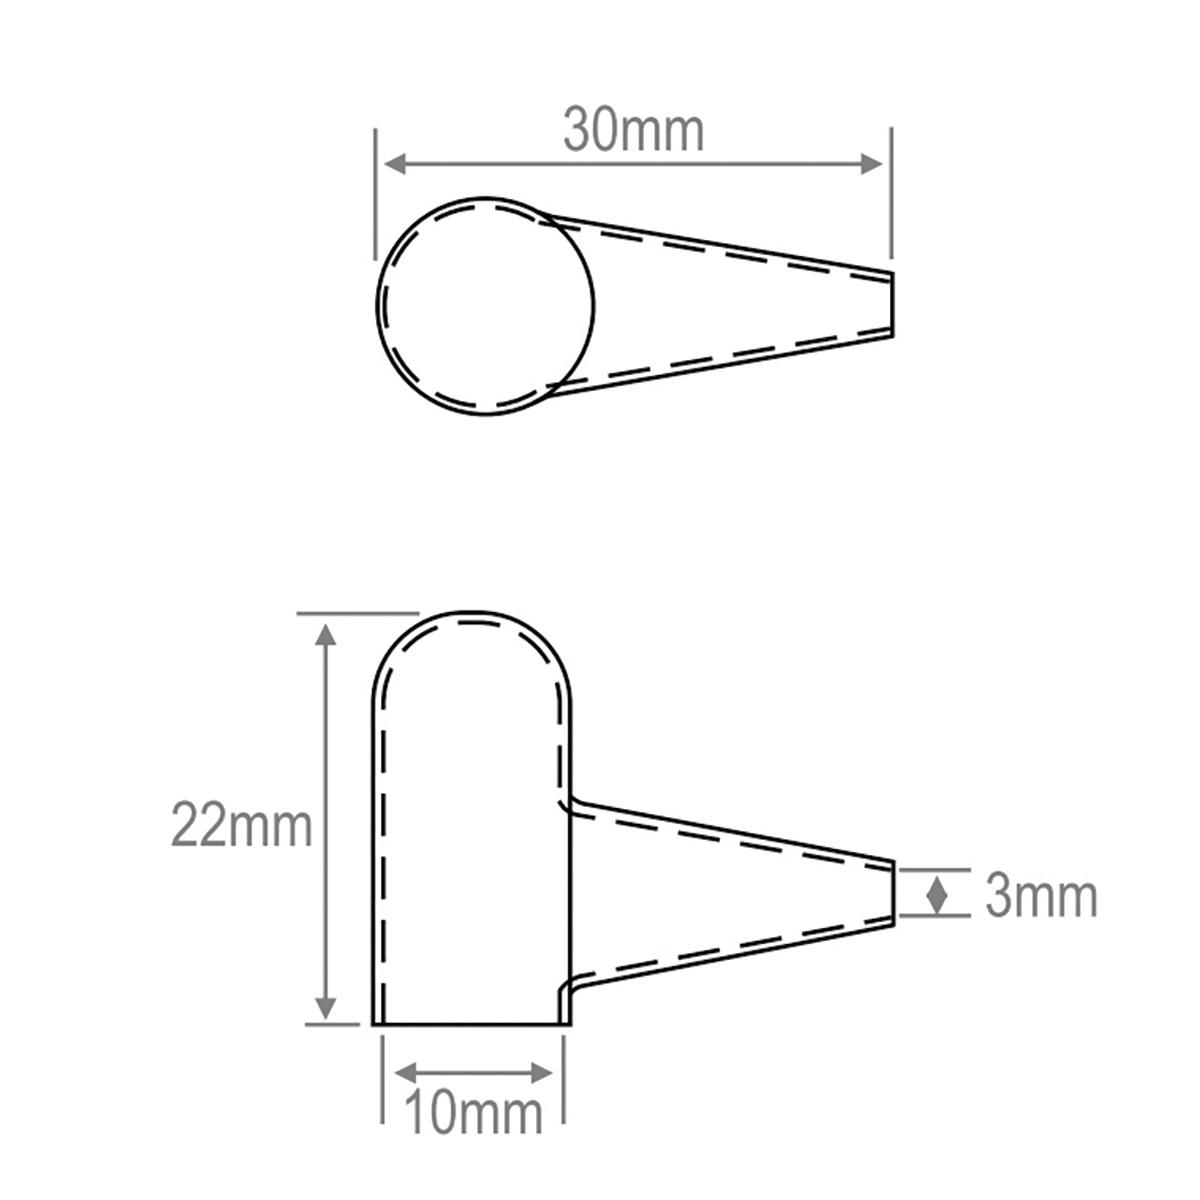 hight resolution of kt71111s retail blister diagram jpg